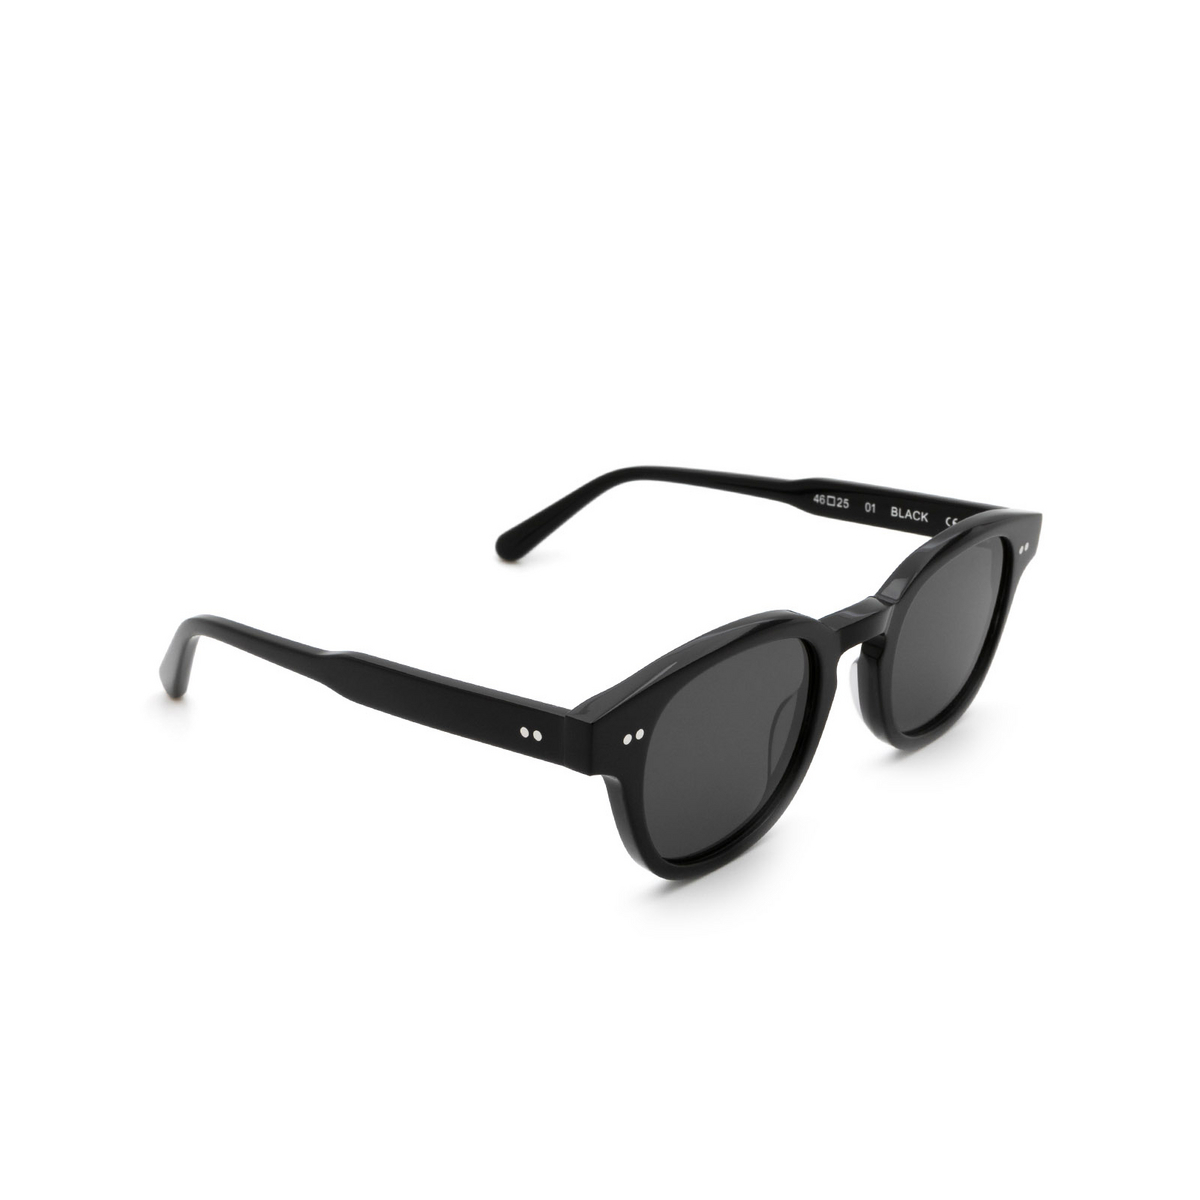 Chimi® Square Sunglasses: 01 color Black - three-quarters view.